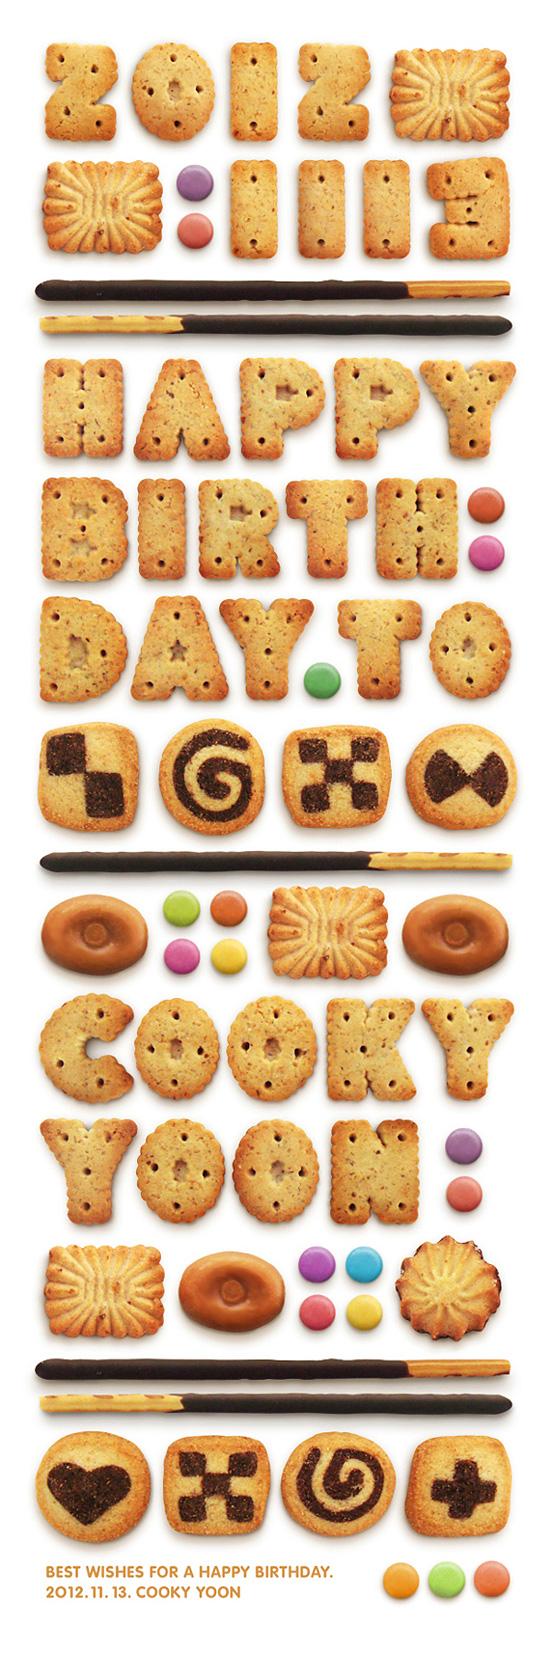 Happy Birthday to Cooky Yoon